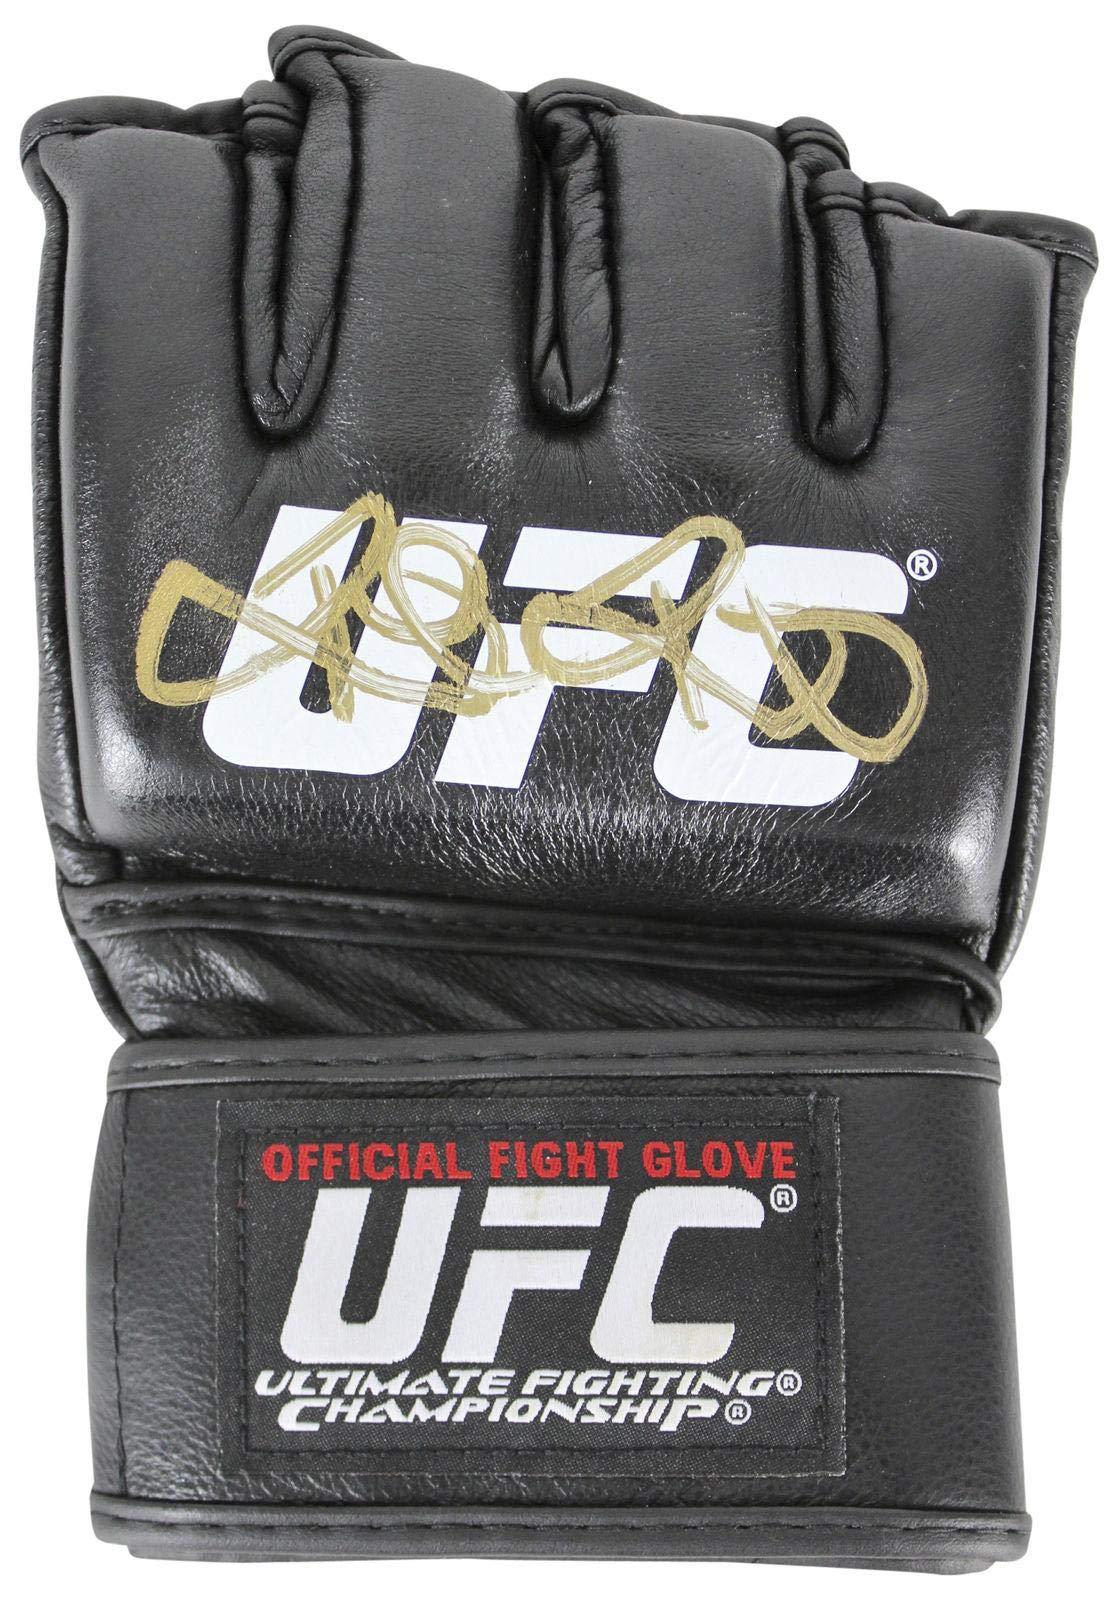 Ronda Rousey Signed UFC Official Fight Glove Fanatics COA #A310363 Fanatics Authentic Certified Autographed UFC Gloves